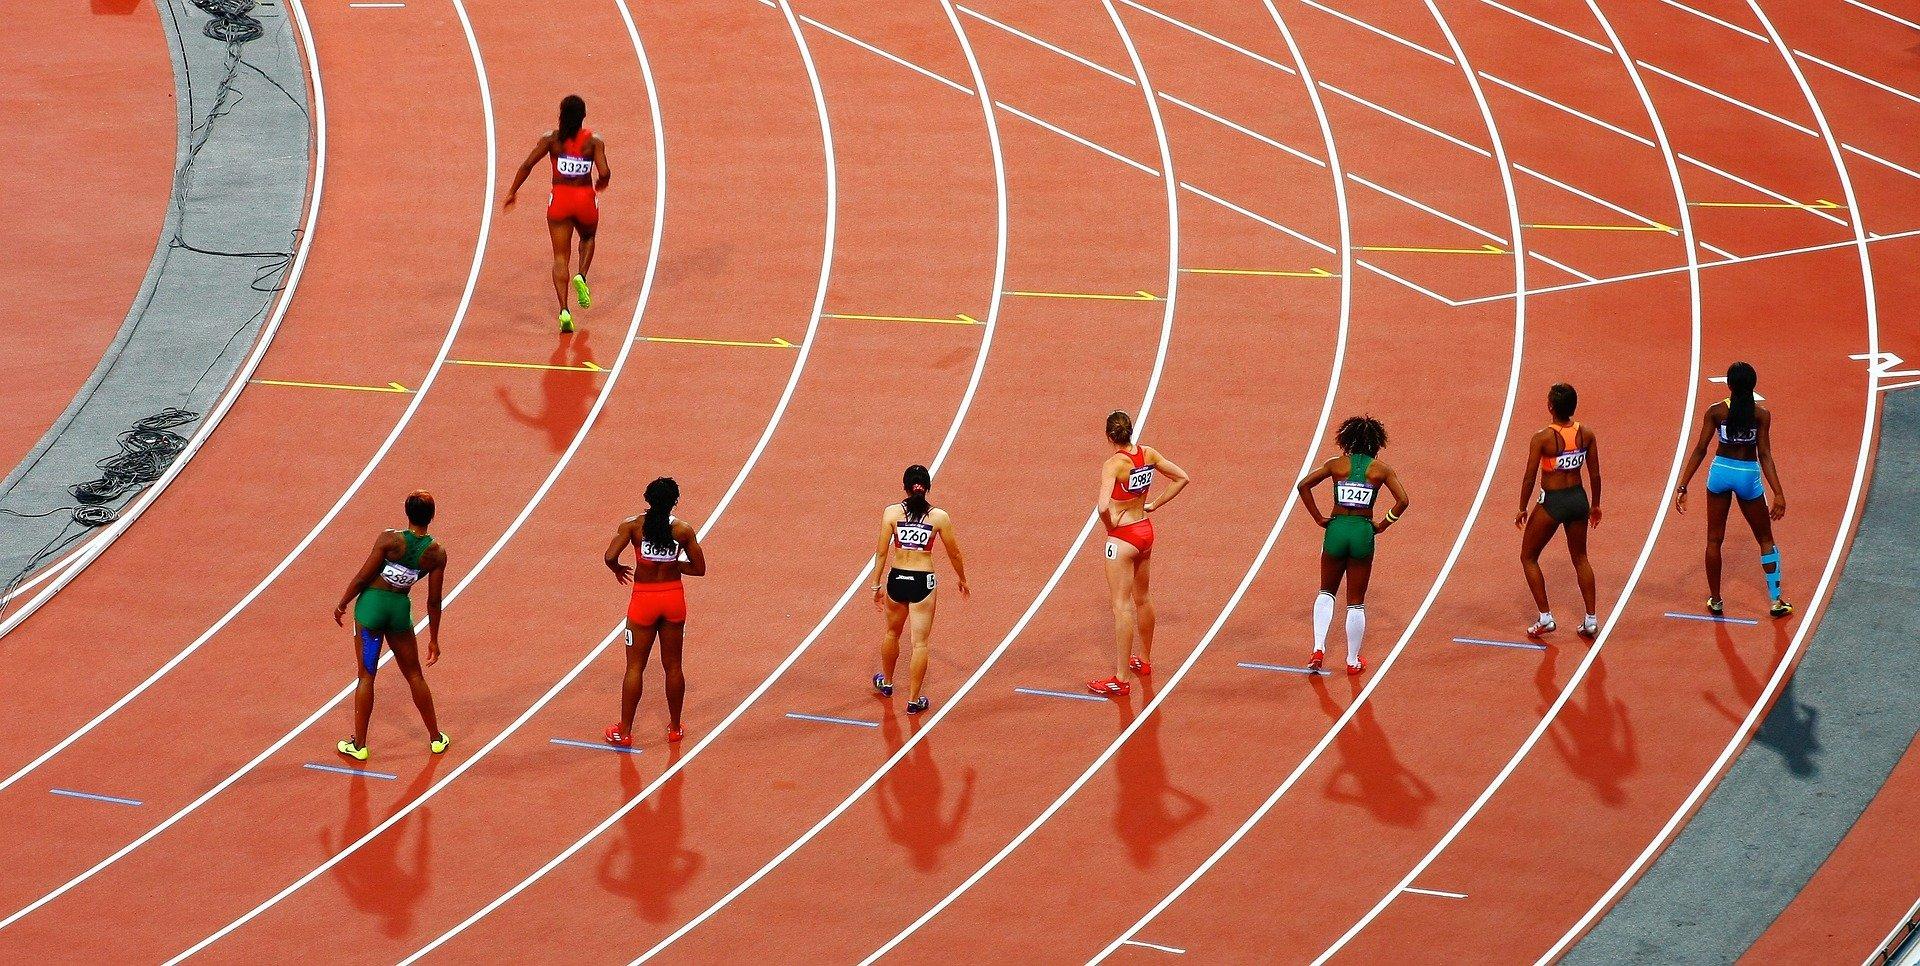 professional female runners waiting on track start line